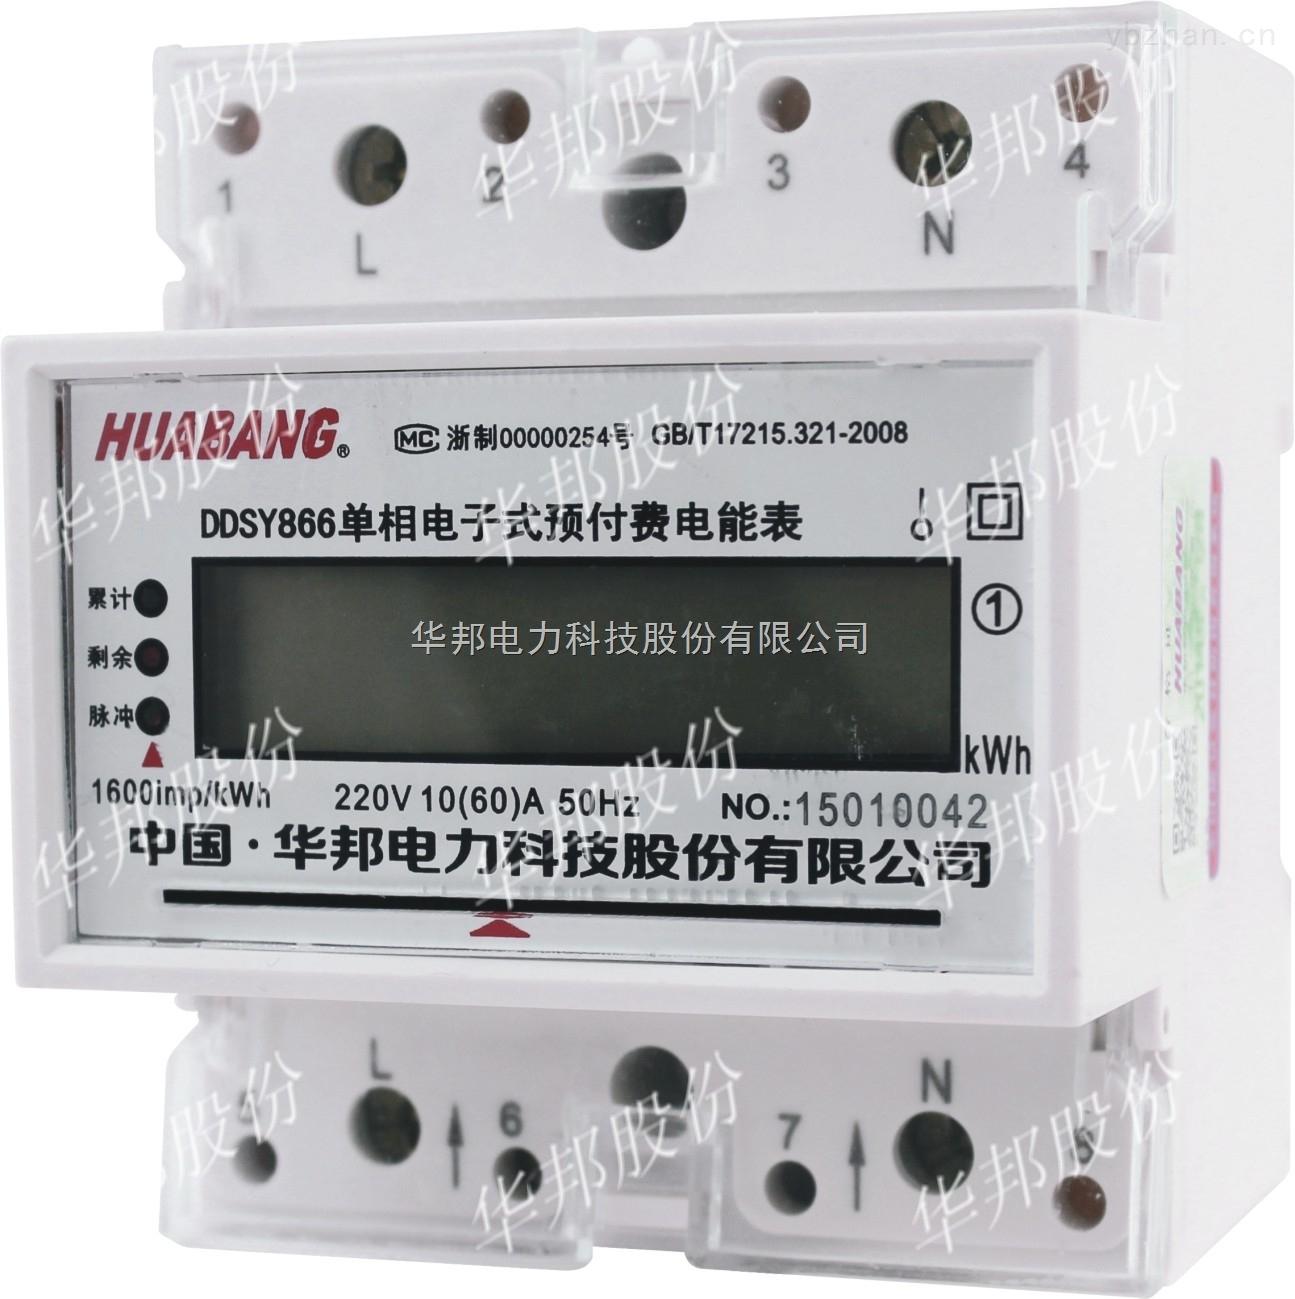 DDSY866-浙江IC卡預付費單相導軌式電度表(插卡售電)